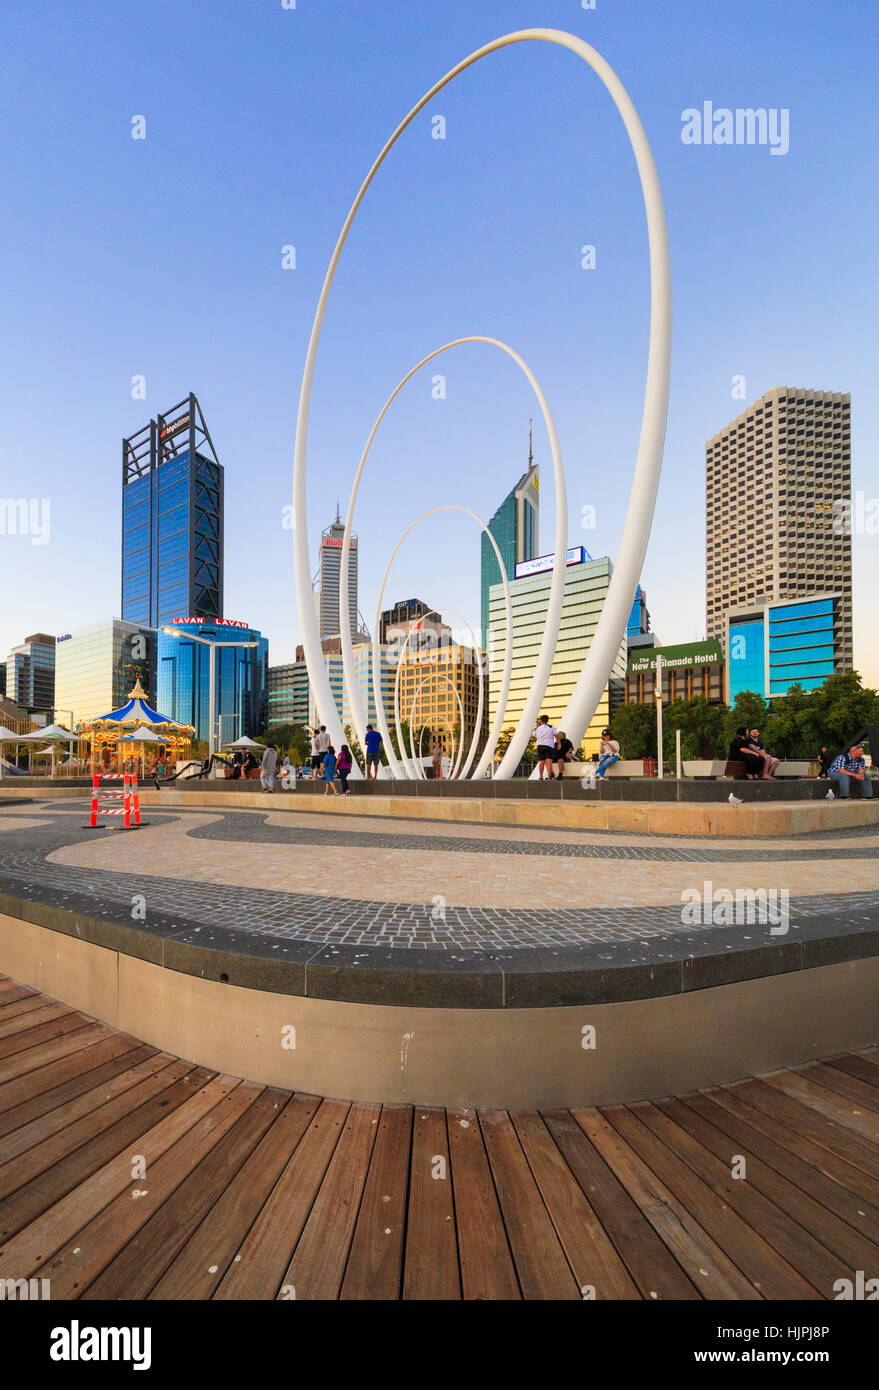 The carbon fiber Spanda sculpture by Christian de Vietri at Elizabeth Quay in Perth, Western Australia - Stock Image